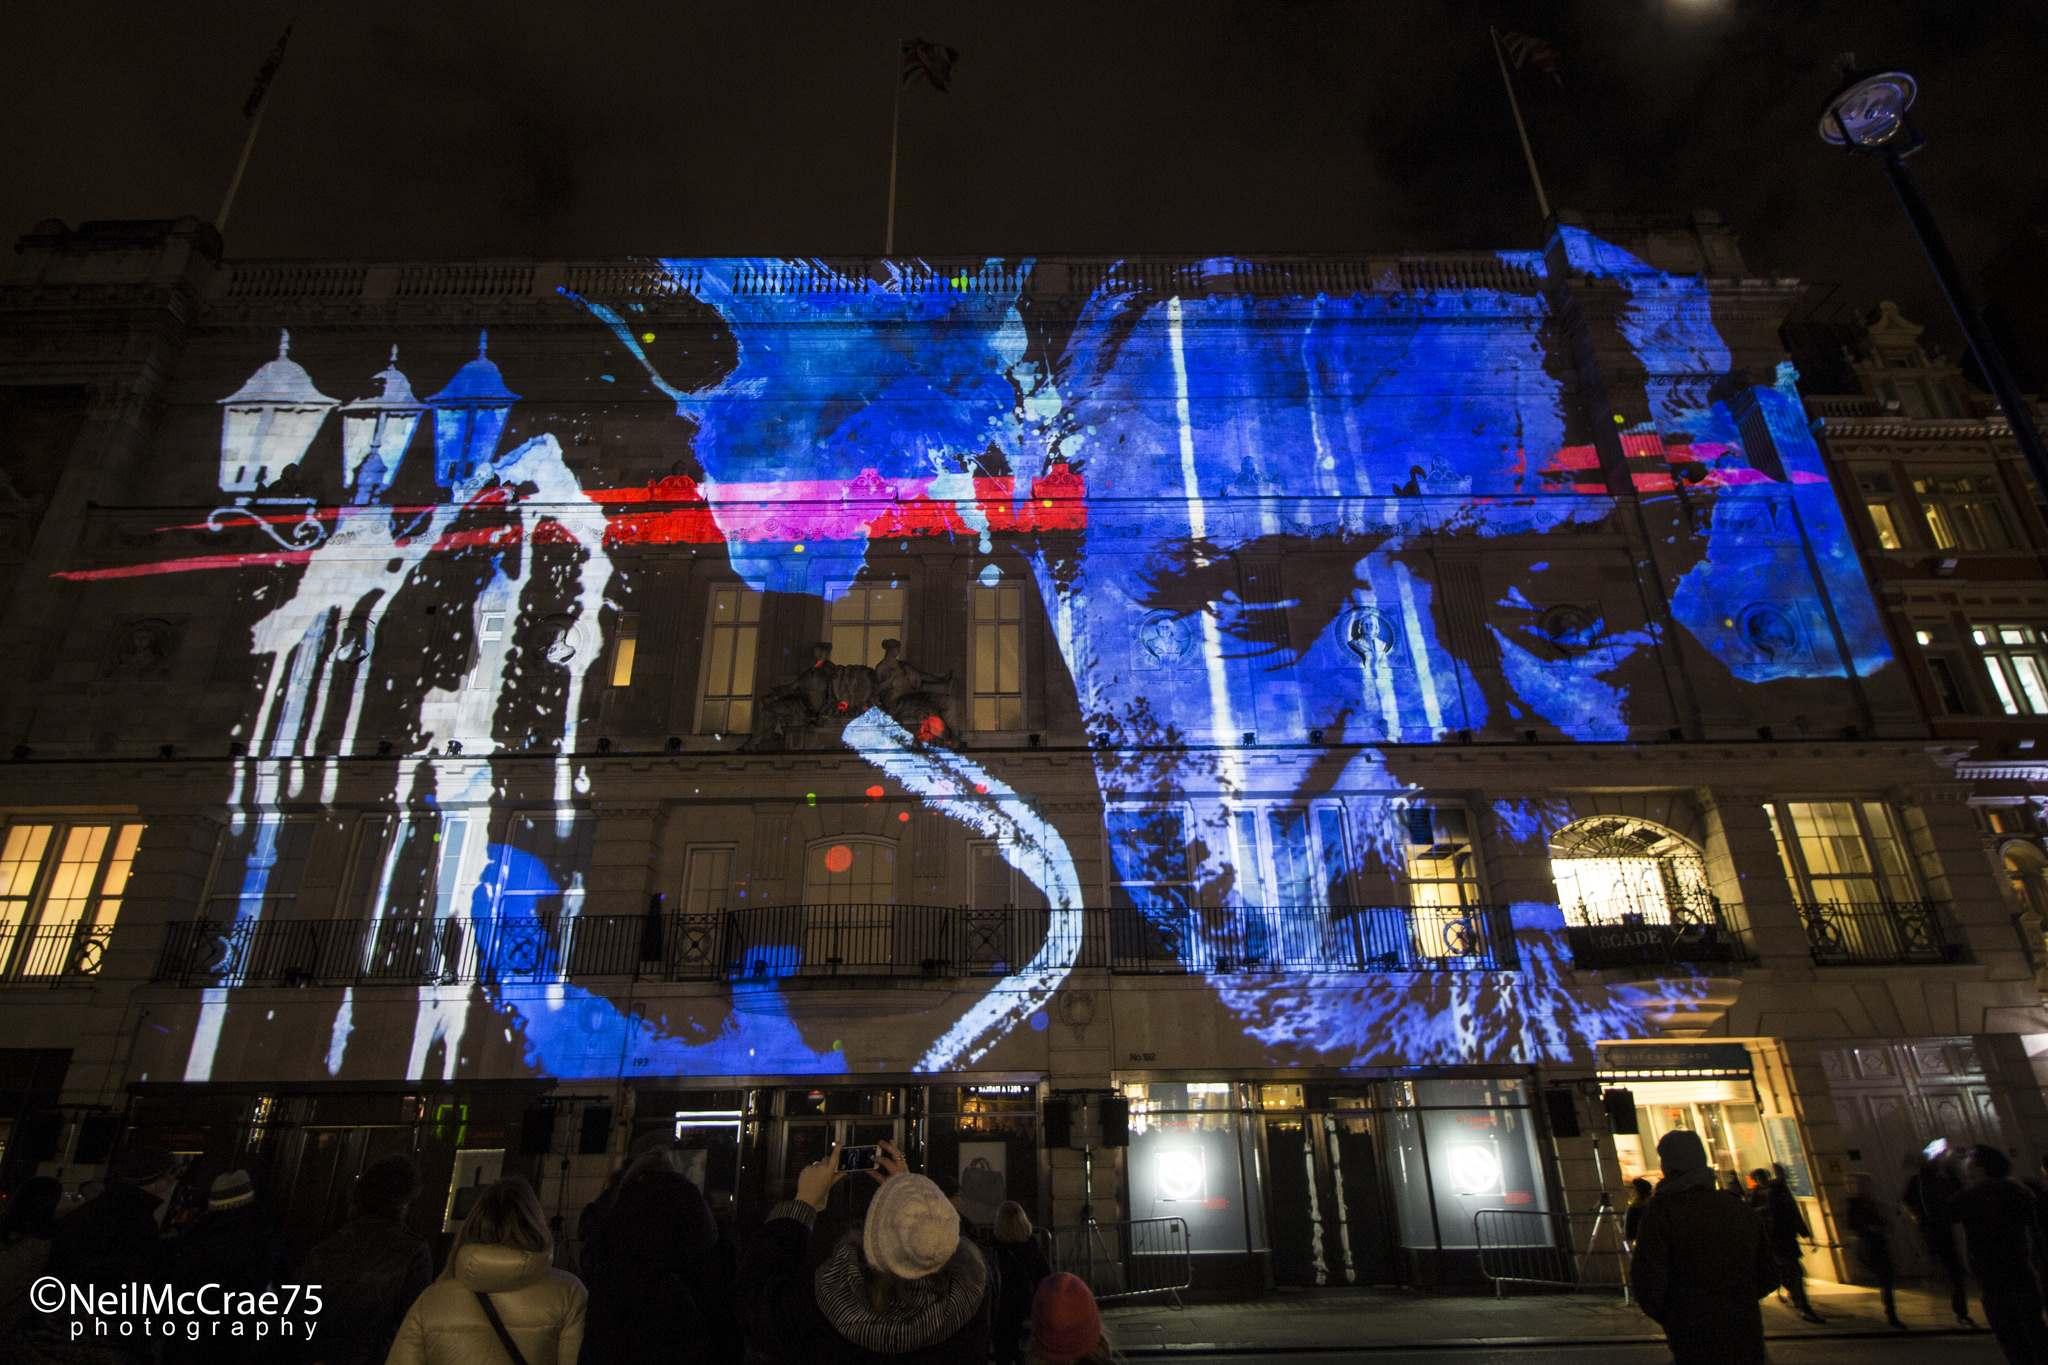 london lumiere festival14 The London Light Lumiere Festival by Neil McCrae